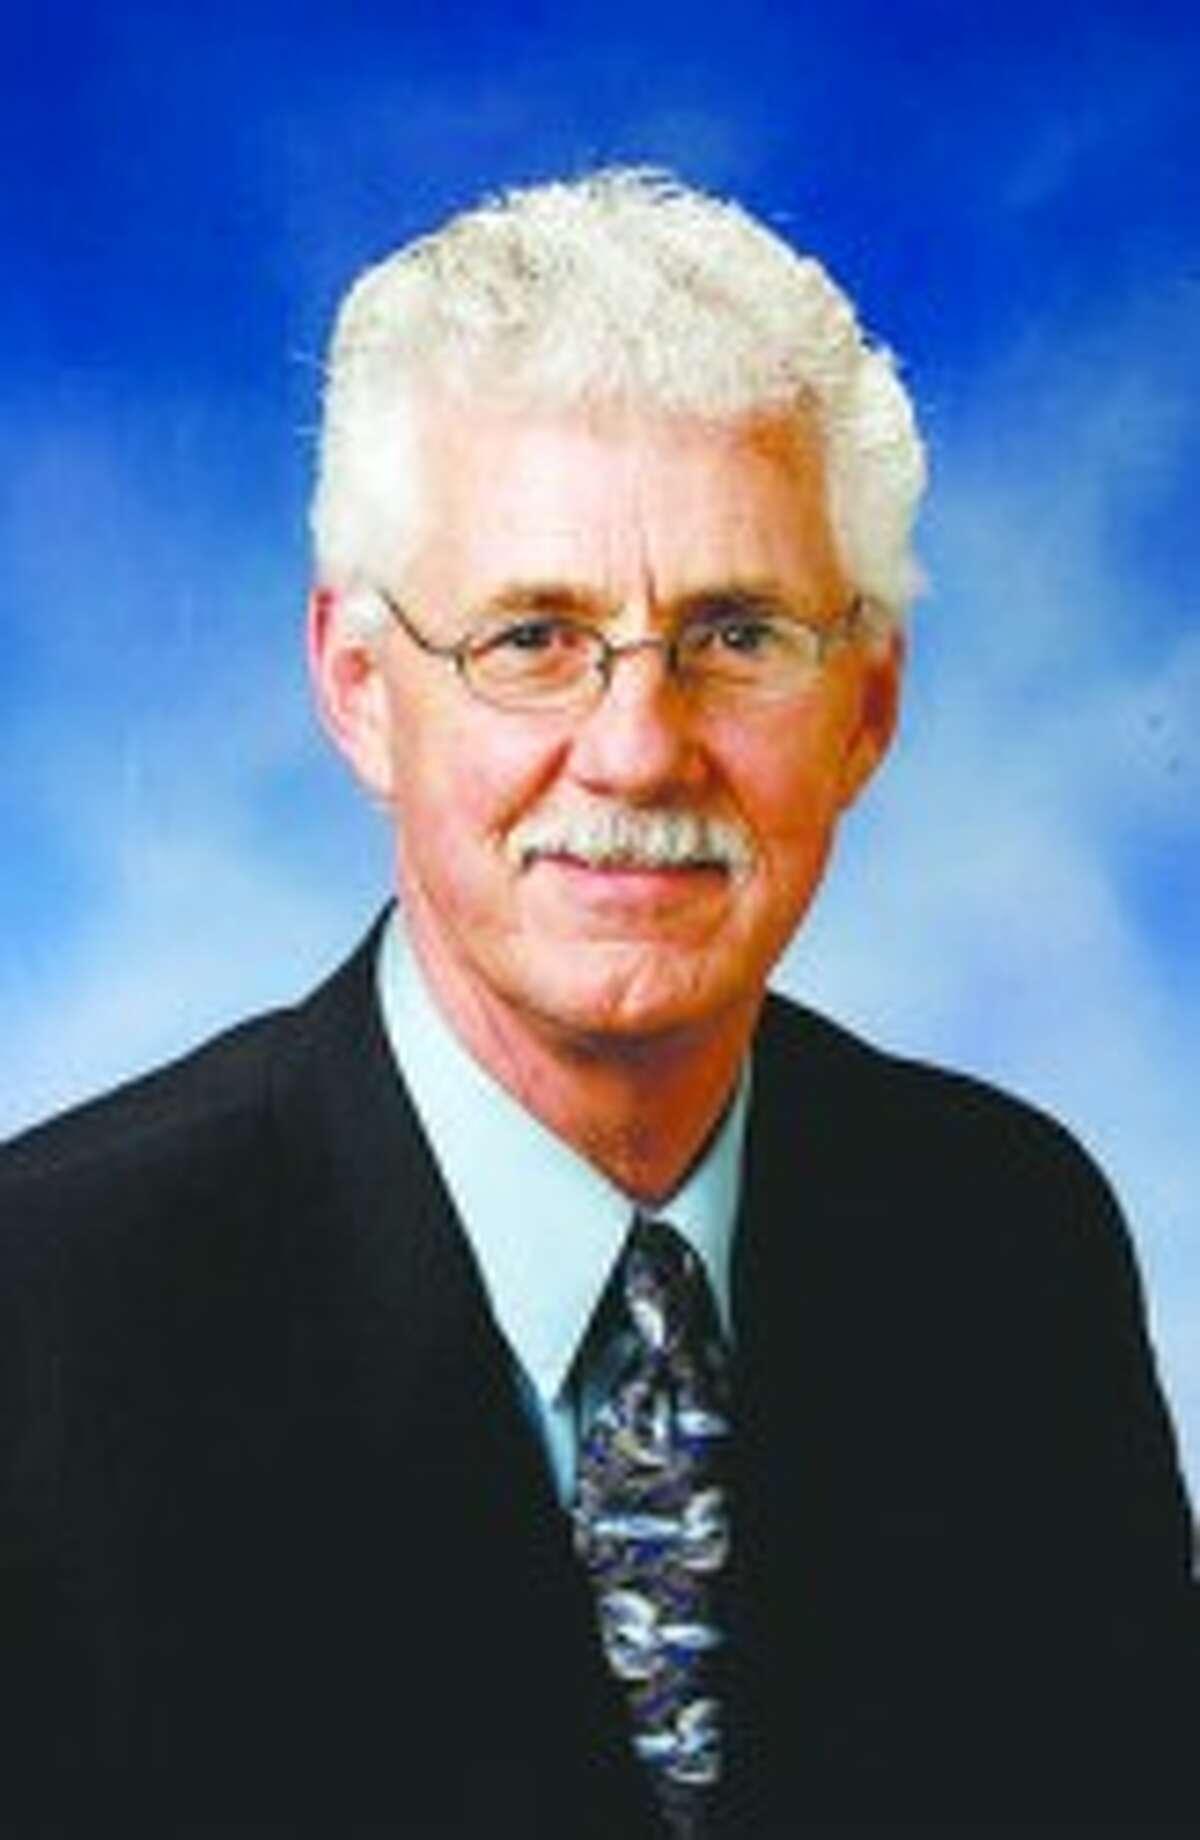 State Sen. Darwin Booher